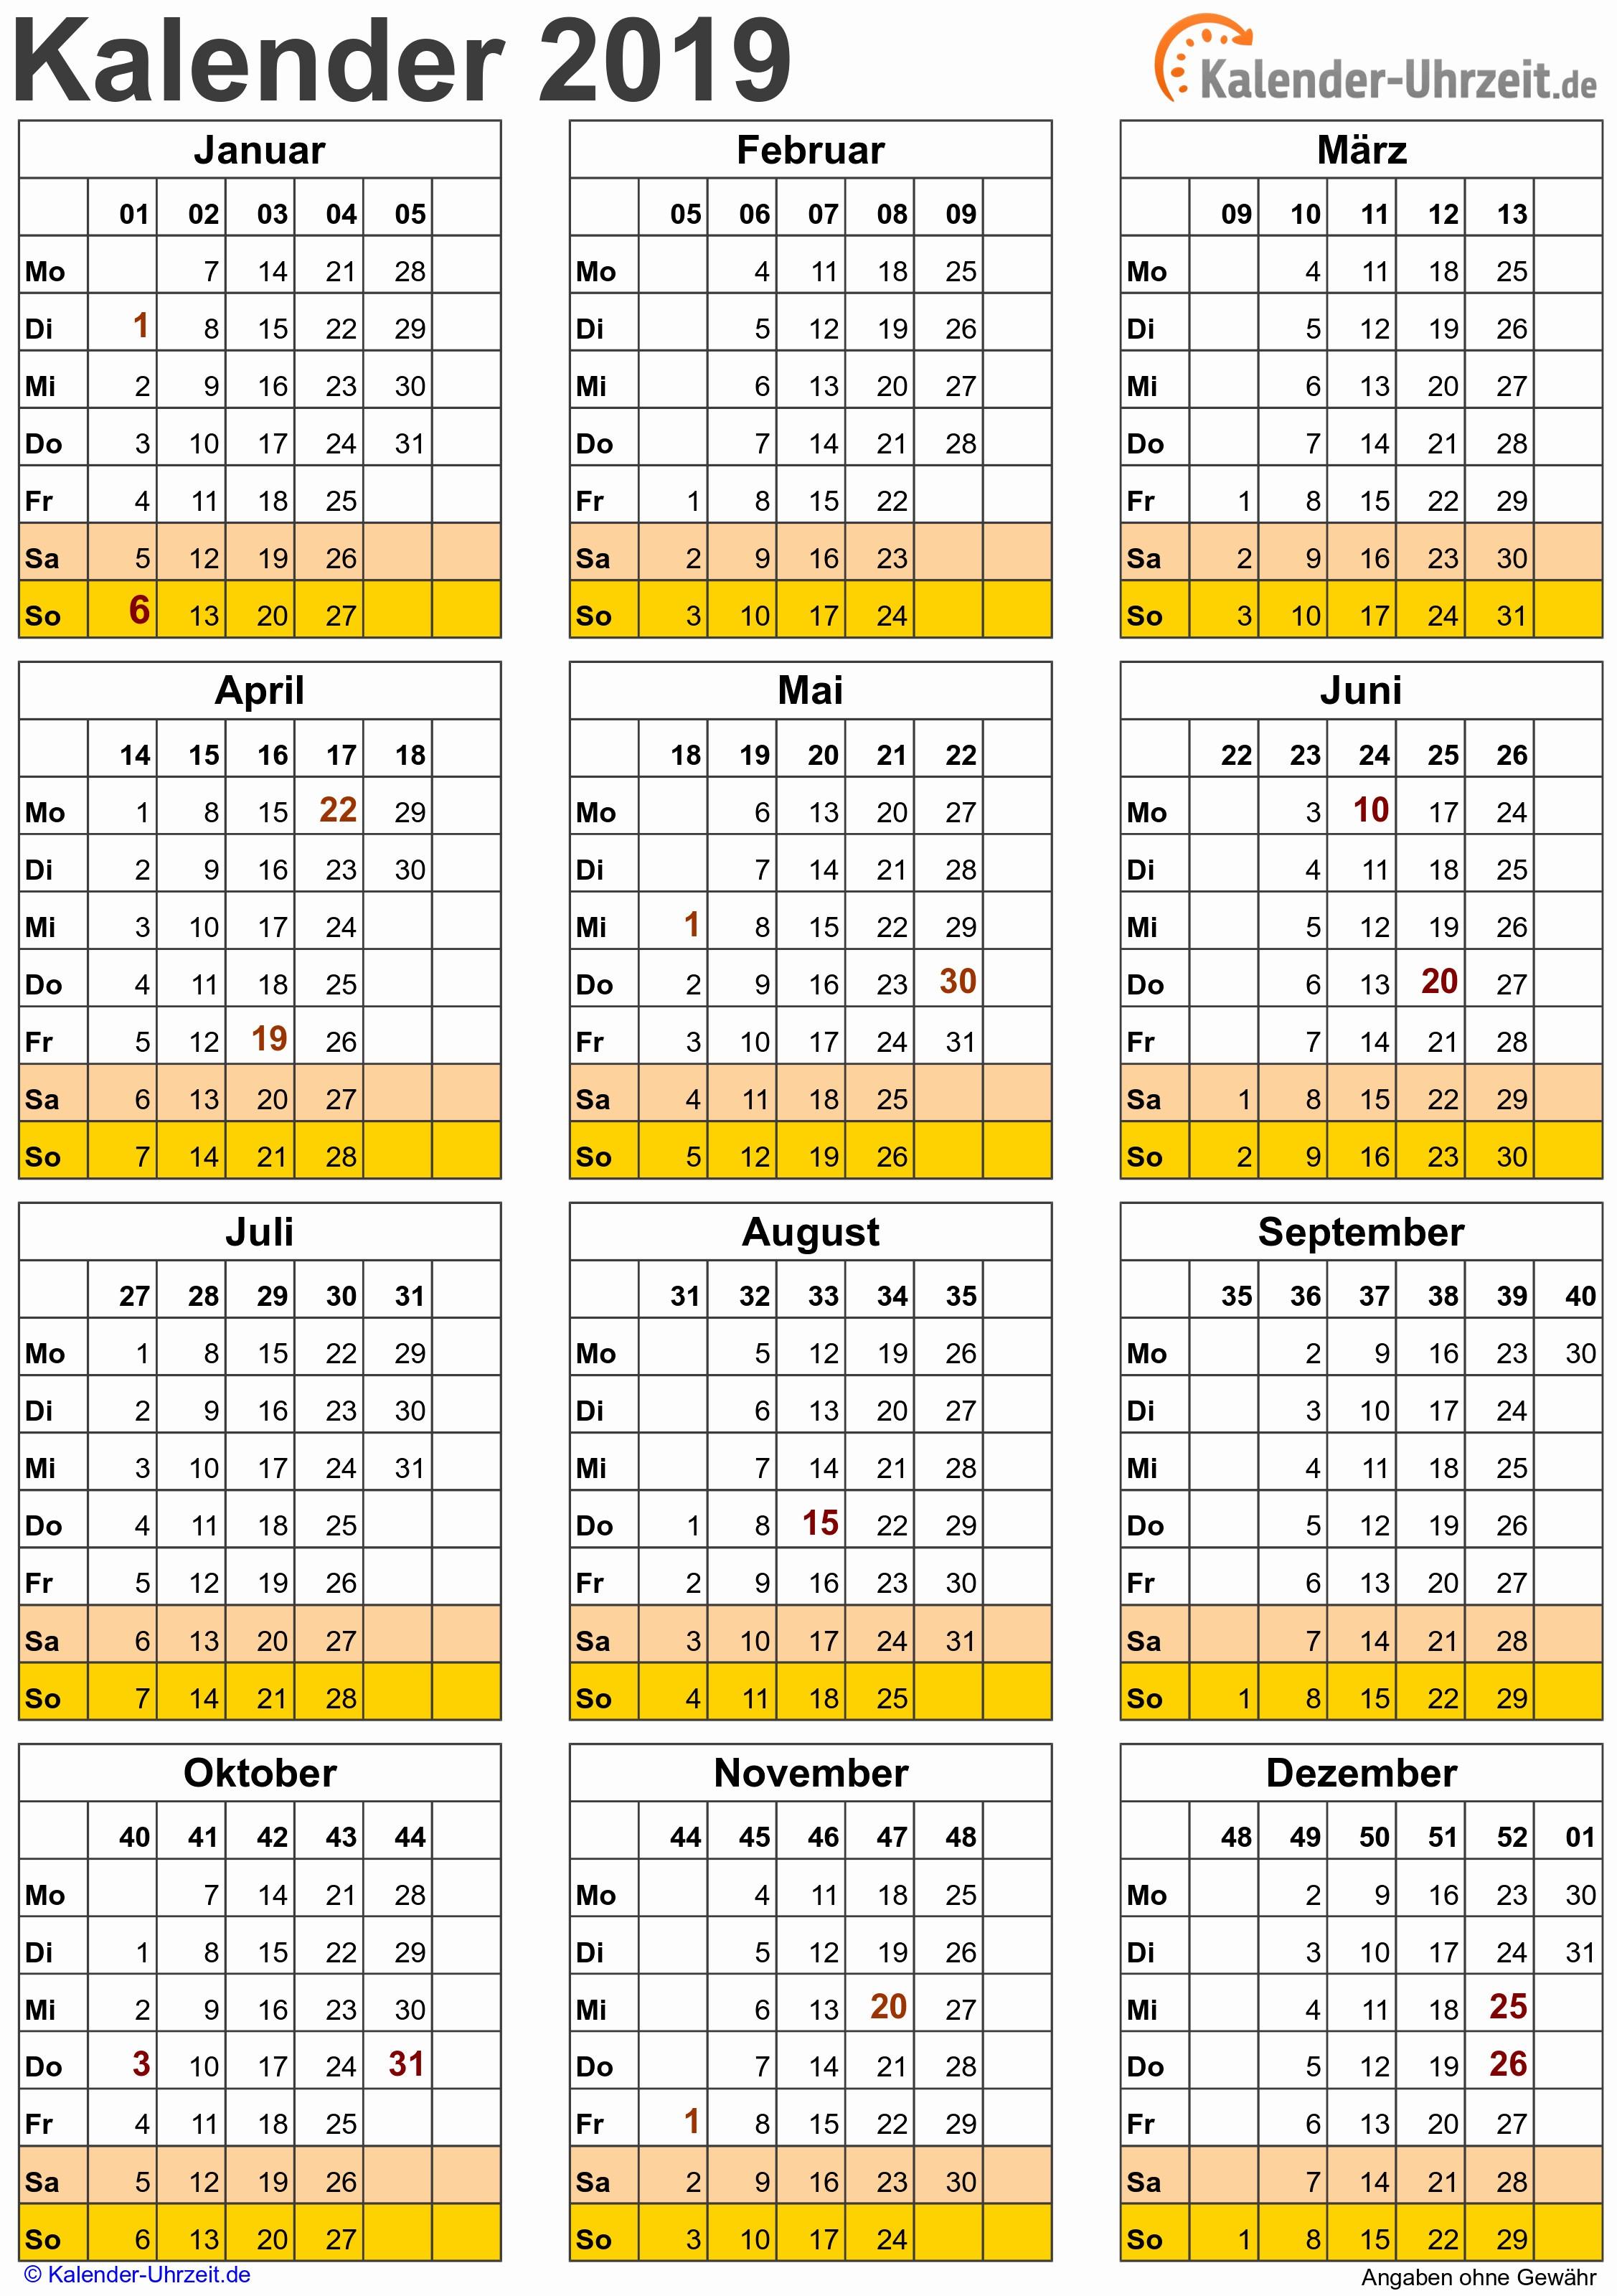 Kalender 2019 Indonesia Pdf Download Más Actual Pdf Kalender 2019 2020 Bayern Kalender 2019 Zum Ausdrucken Kostenlos Of Kalender 2019 Indonesia Pdf Download Más Populares Kalender In Excel Best Monthly Meeting Calendar Template Awesome